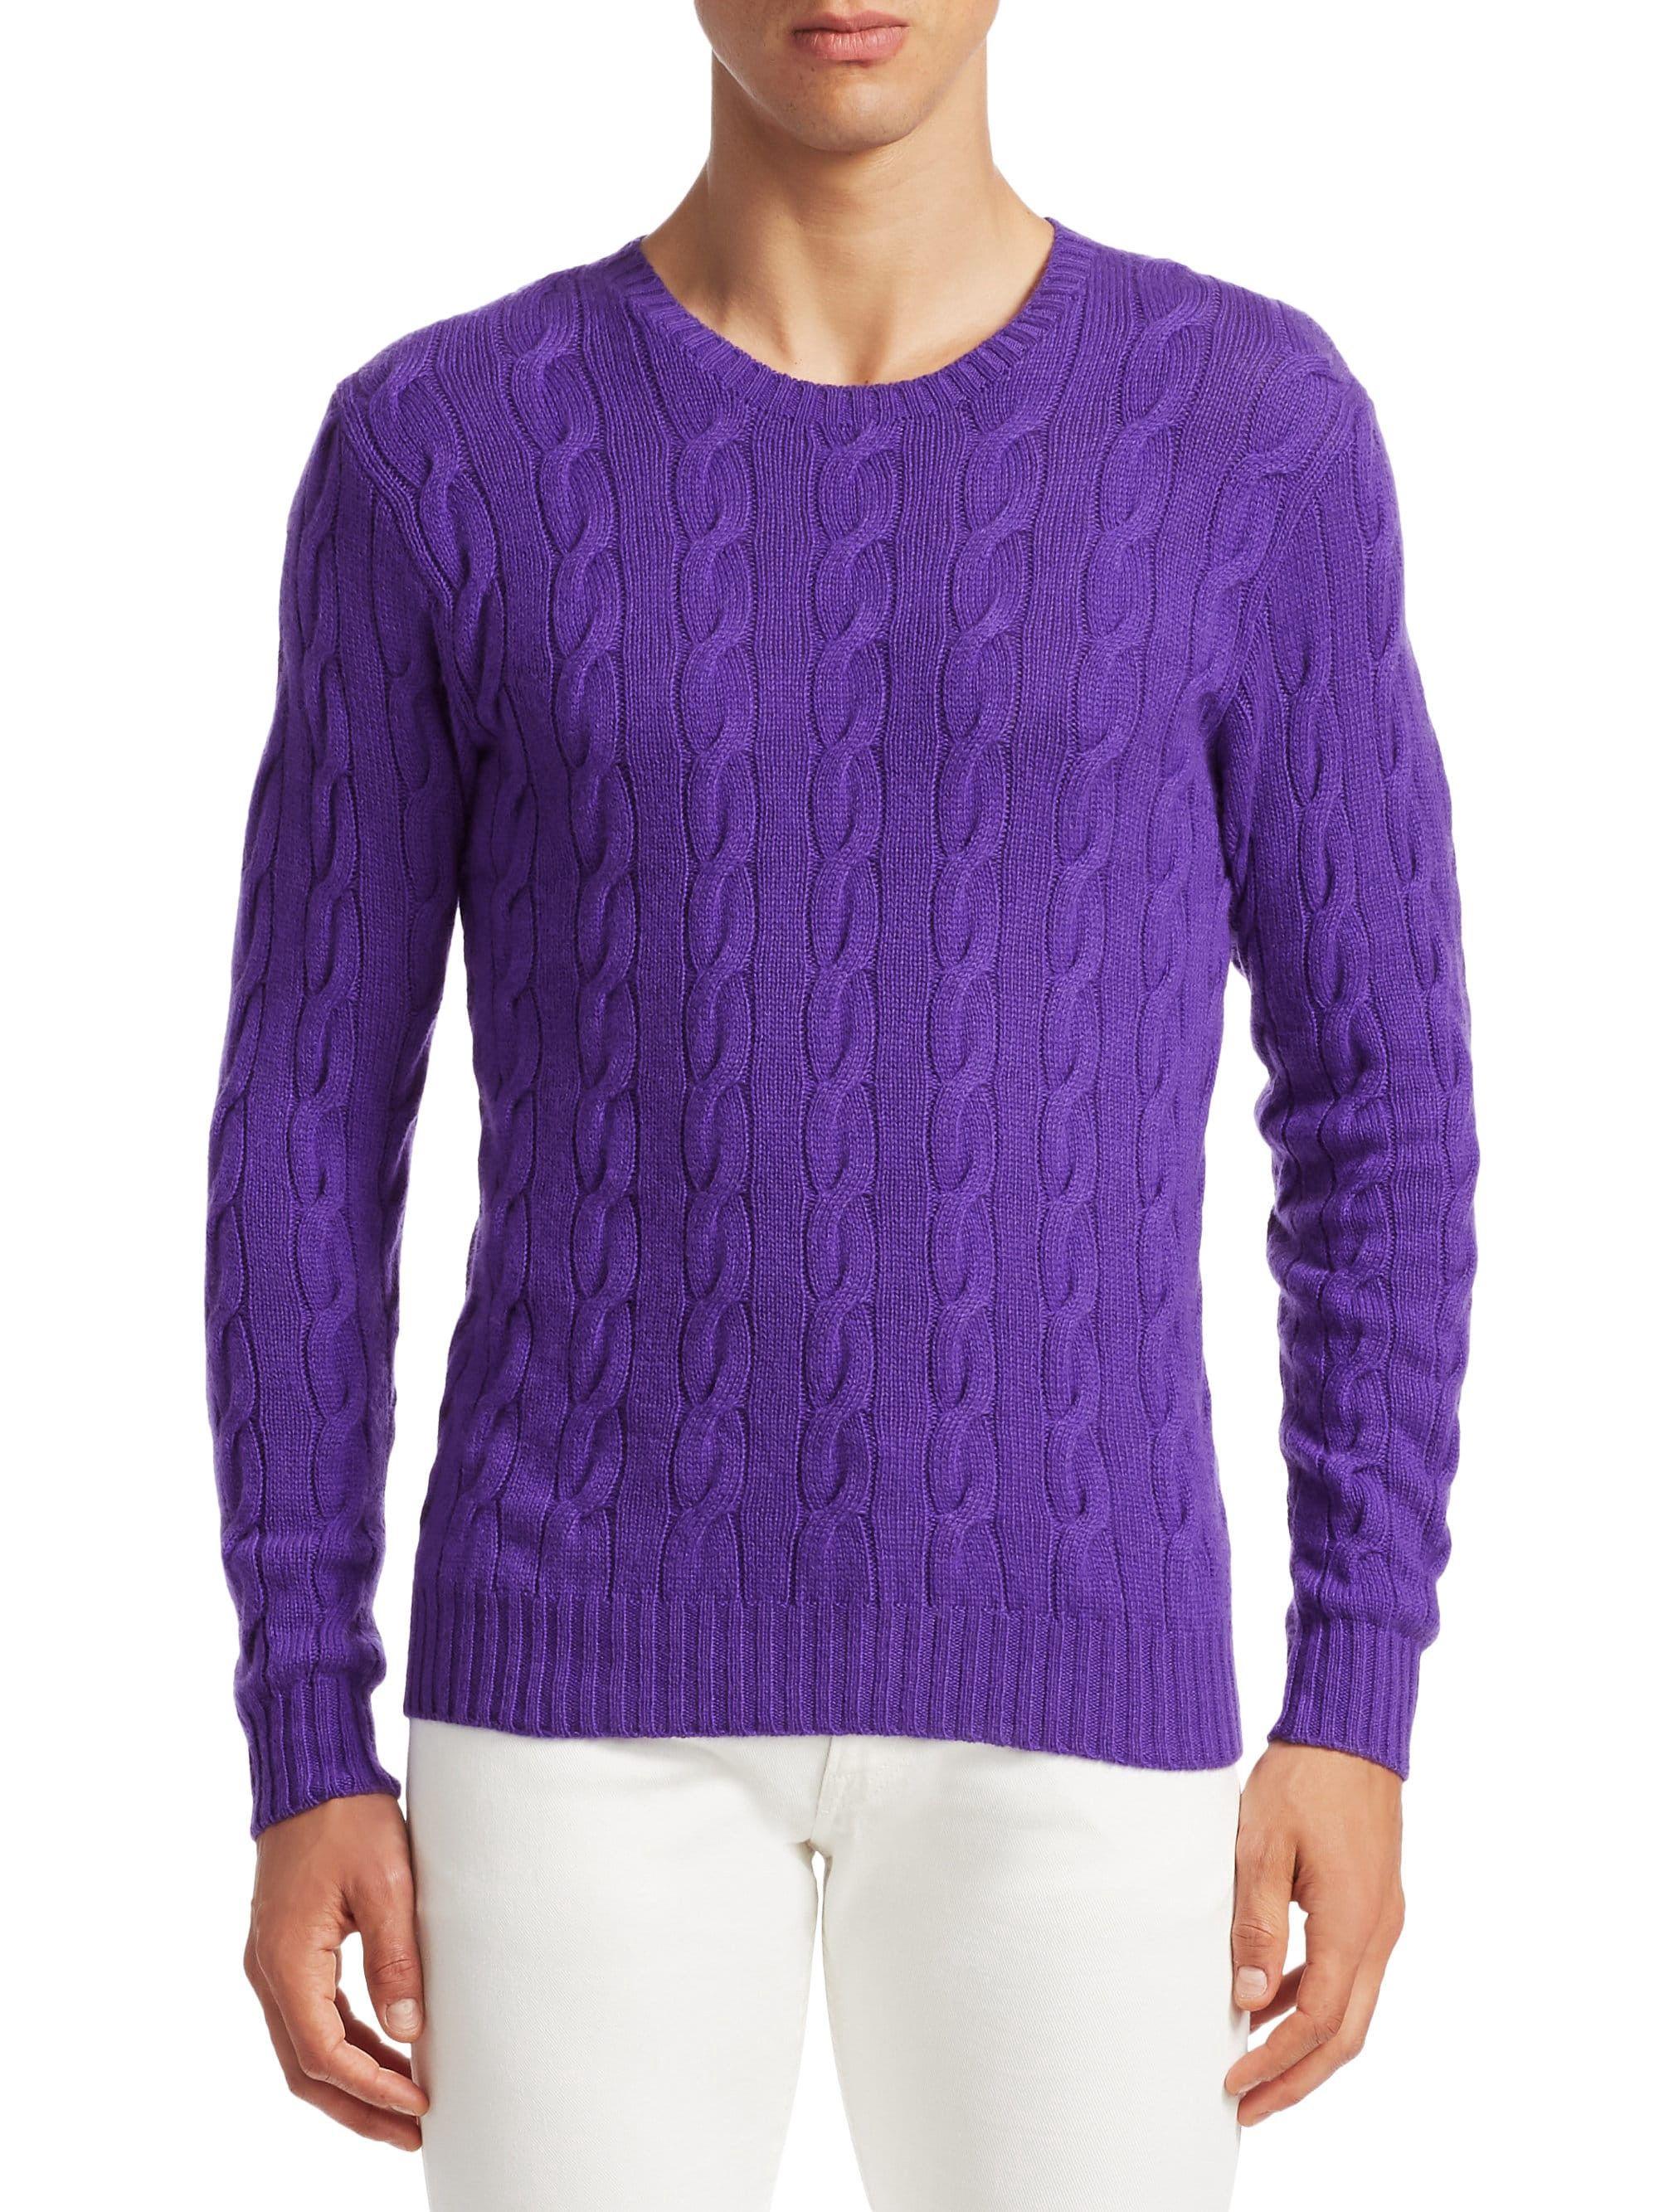 1d19e86152 Ralph Lauren Cable Knit Cashmere Sweater - Classic Violet Large in ...